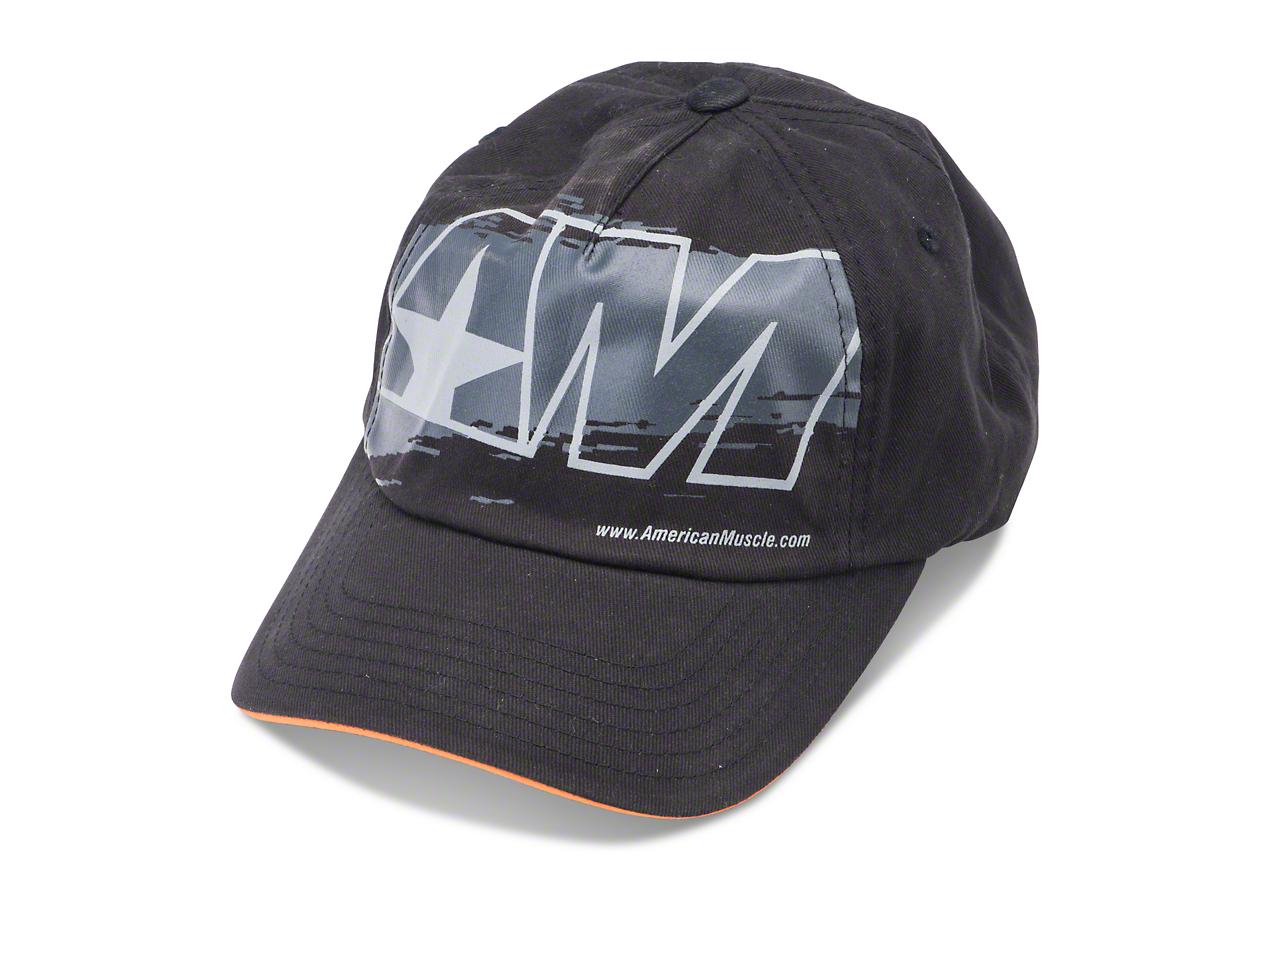 AmericanMuscle Shredded Hat - Black